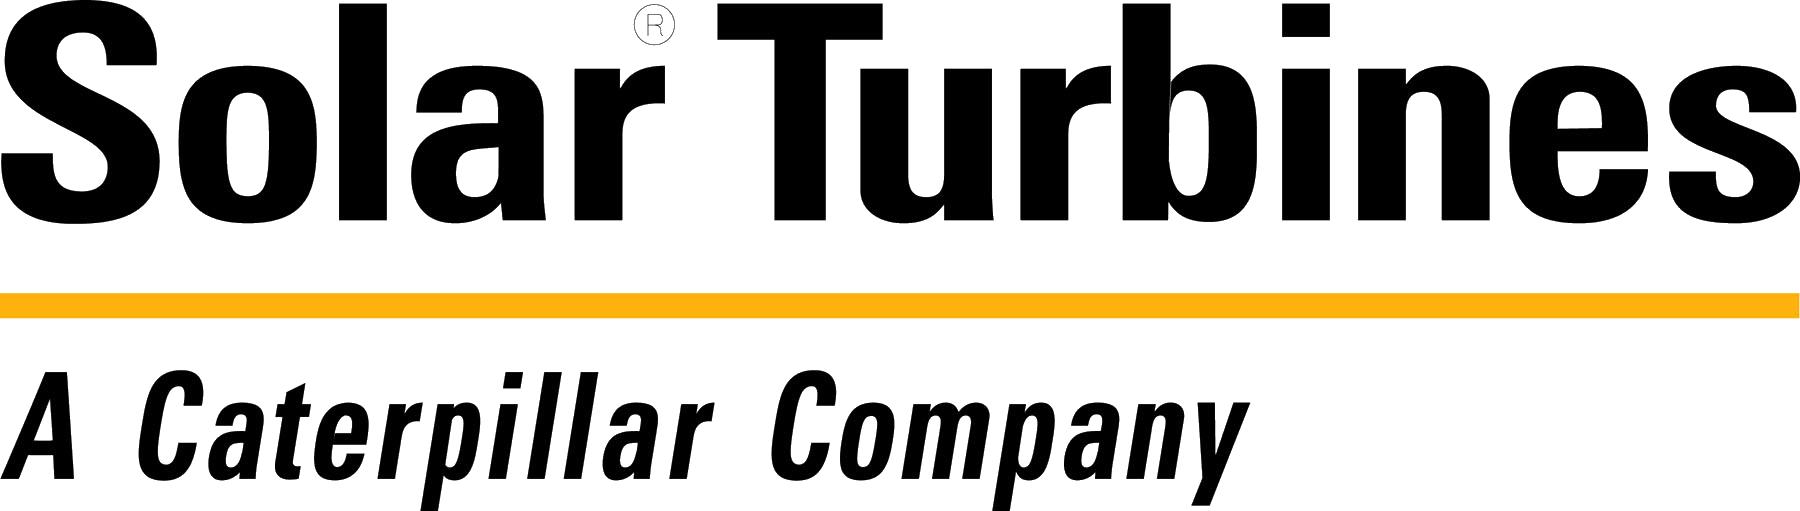 Solar Turbines Logo.png